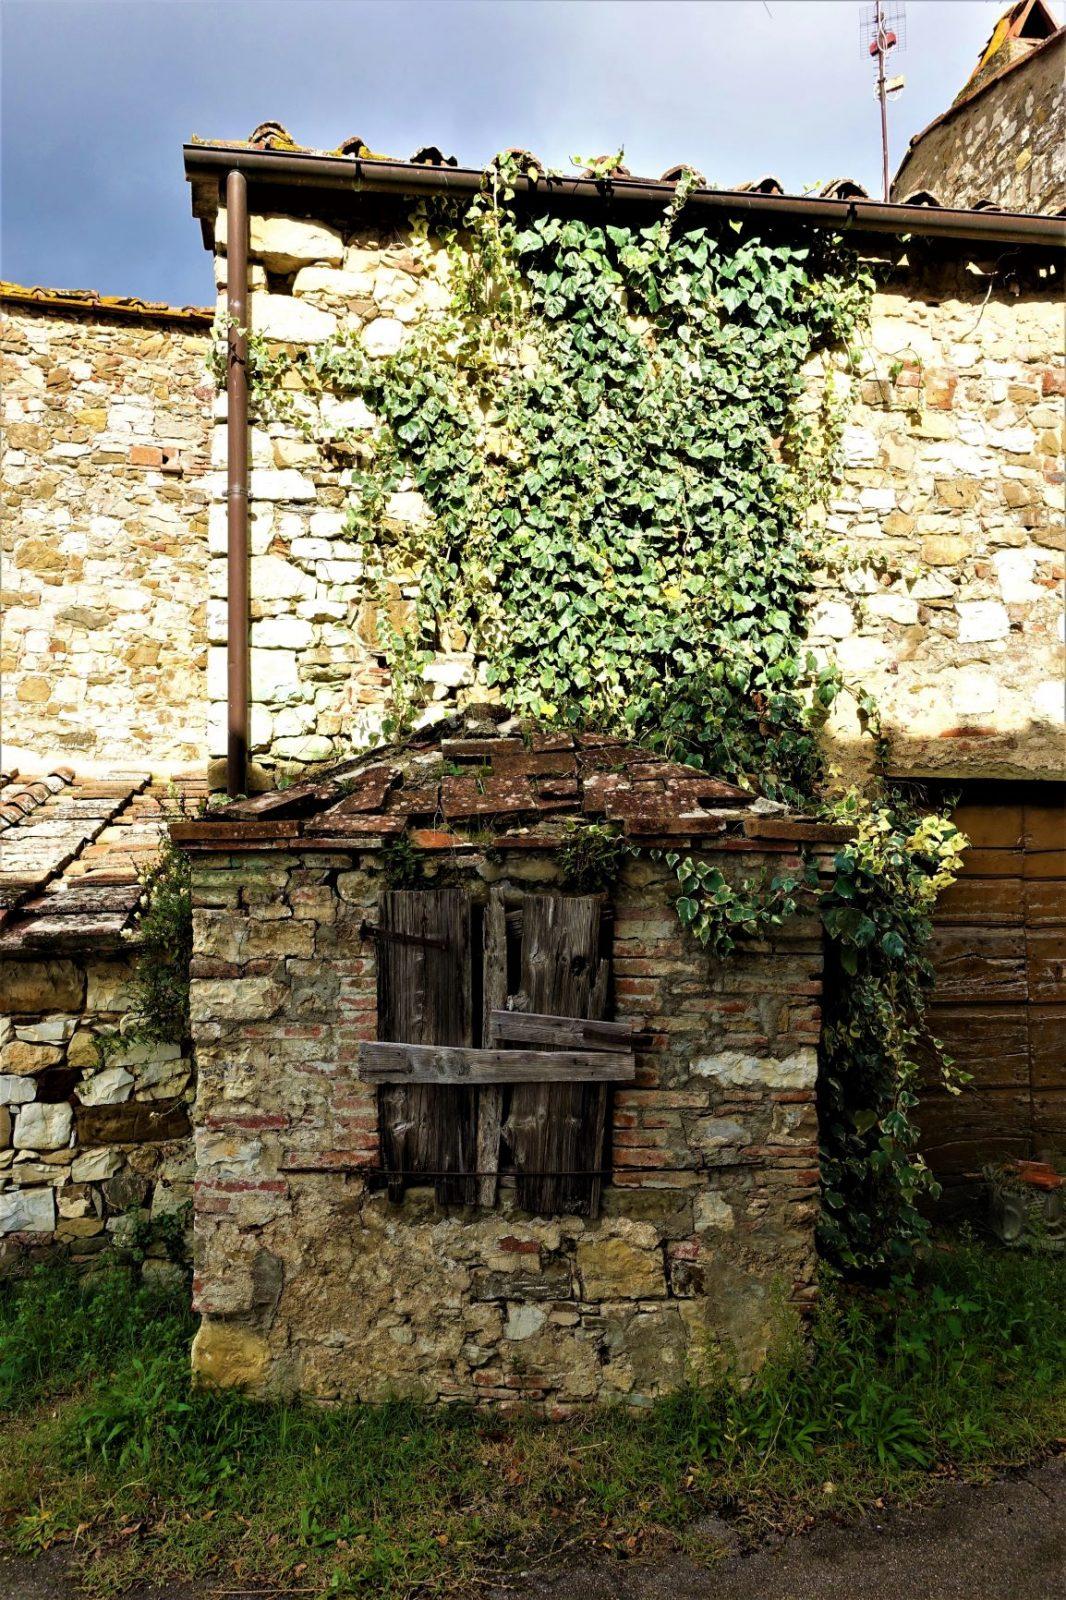 Vakkert gammelt falleferdig hus i Toscana